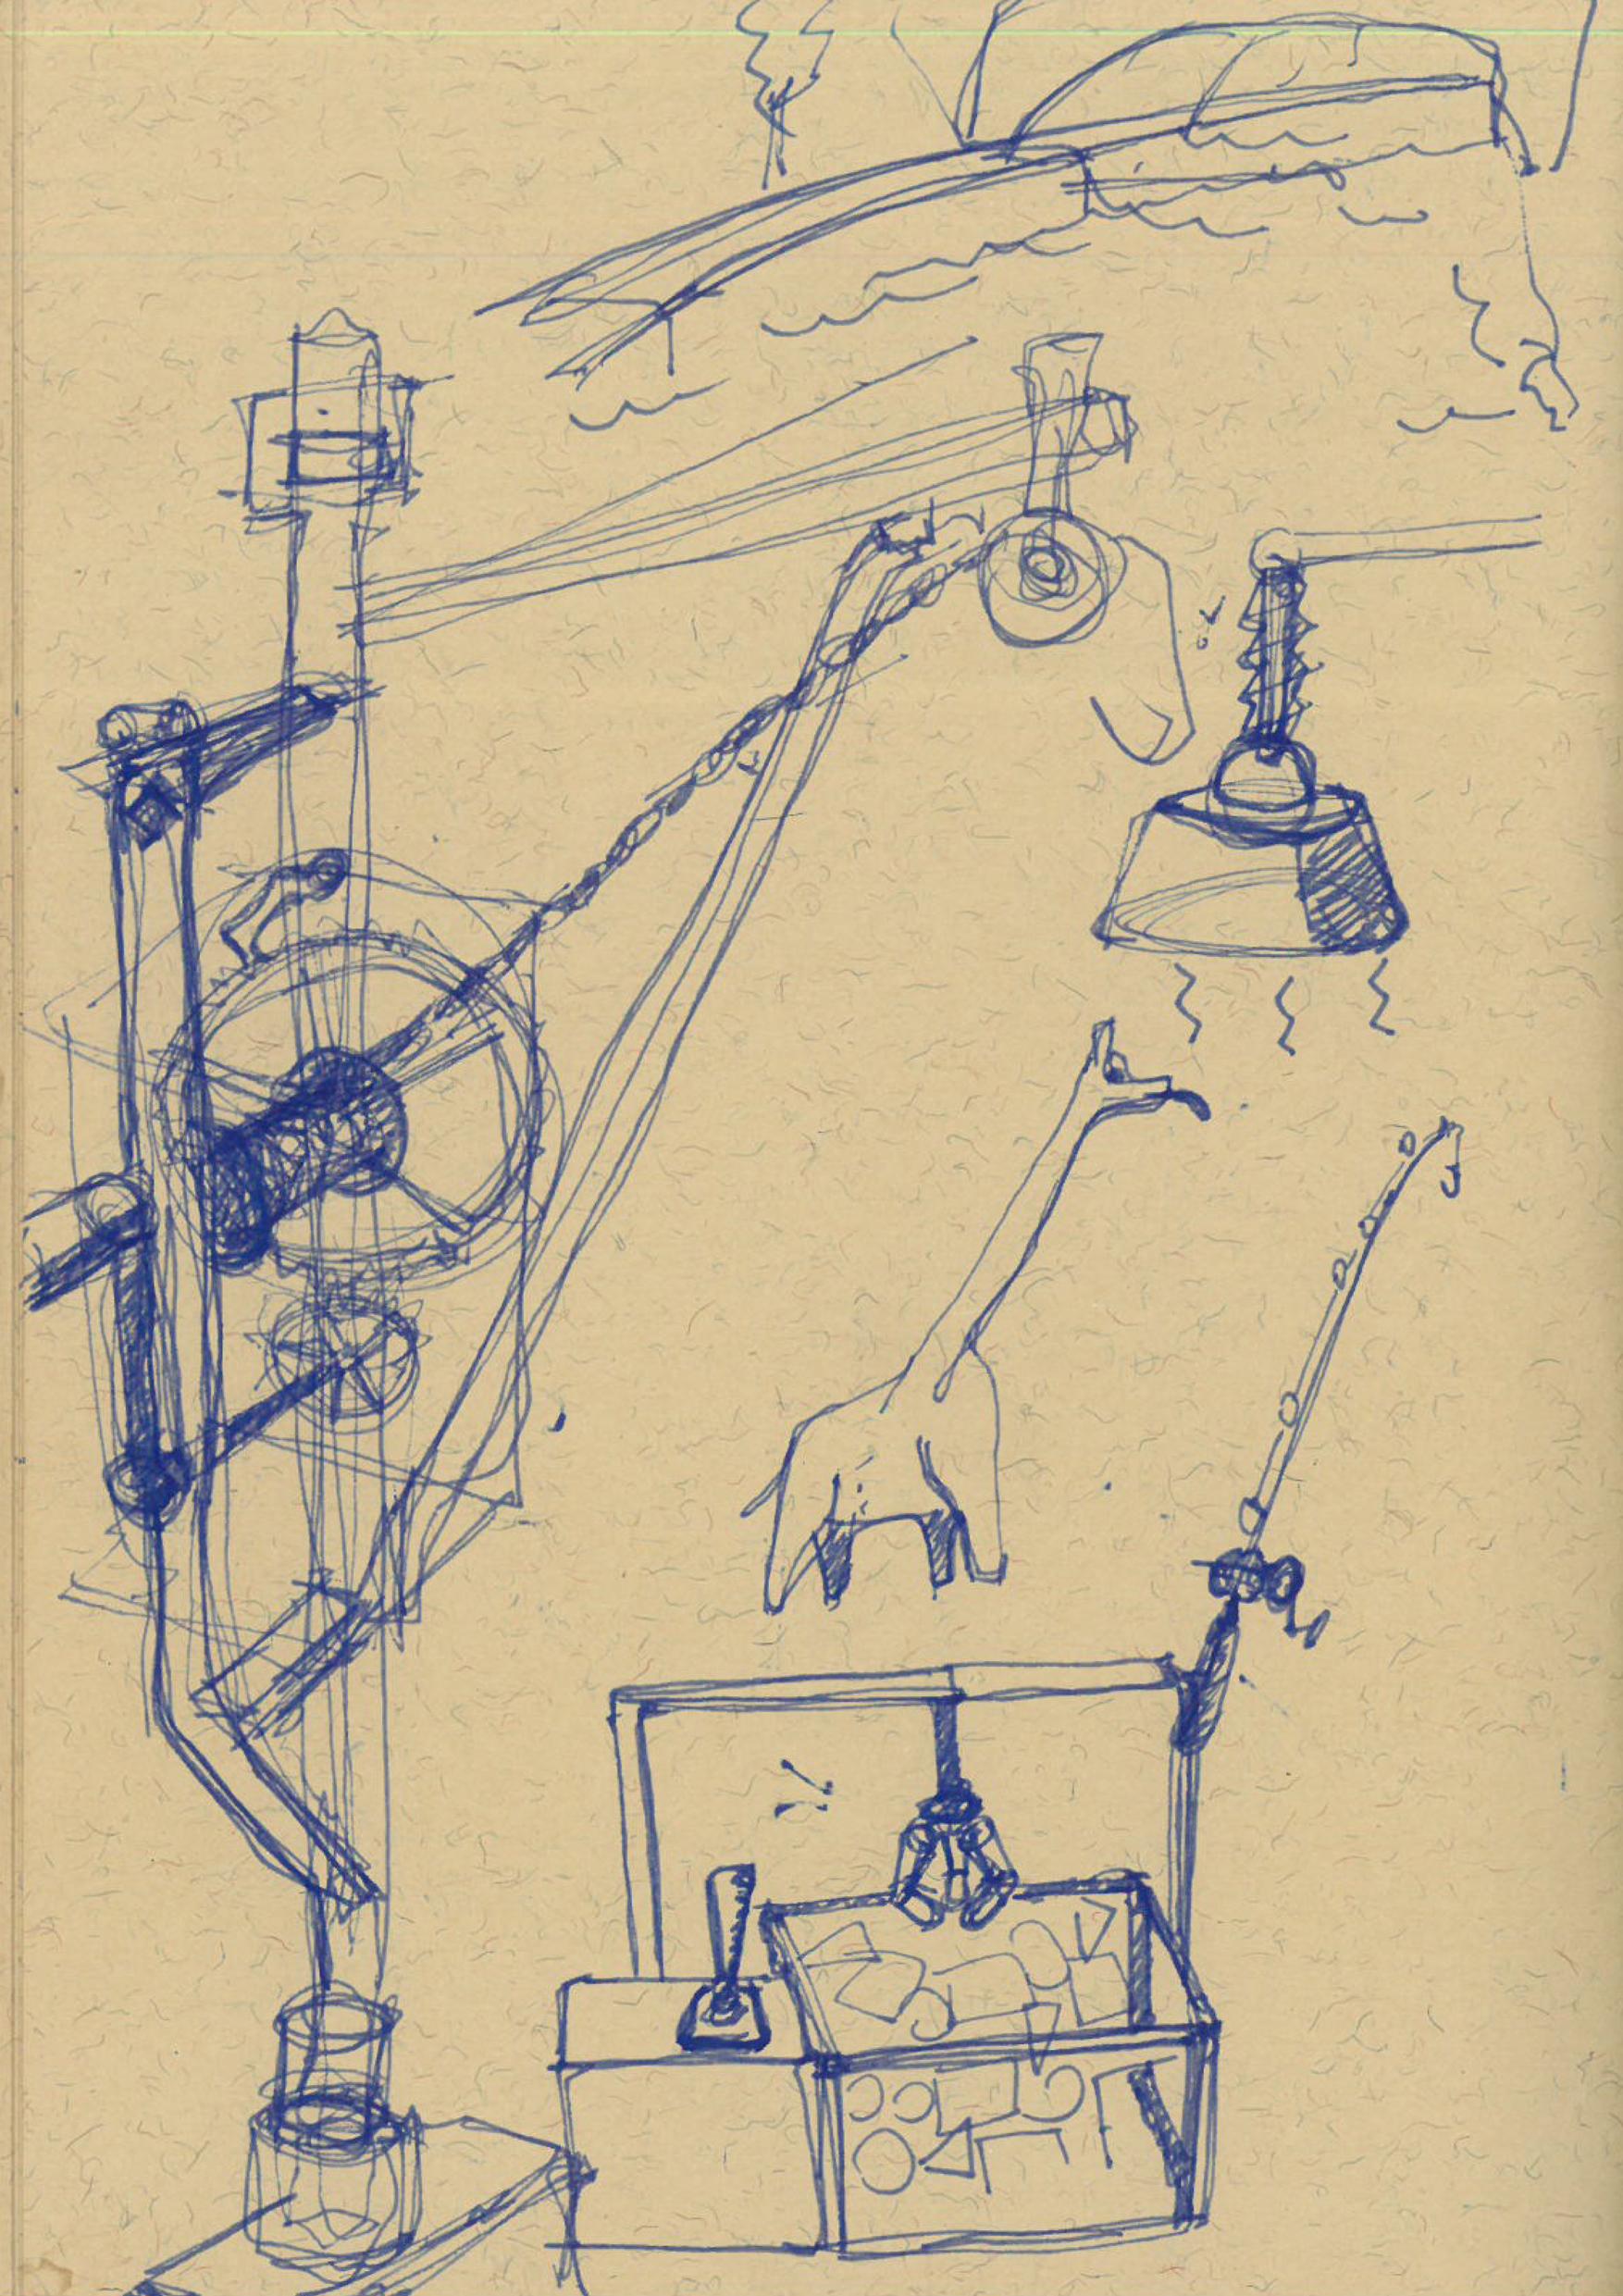 giraffe_Sketch.jpg